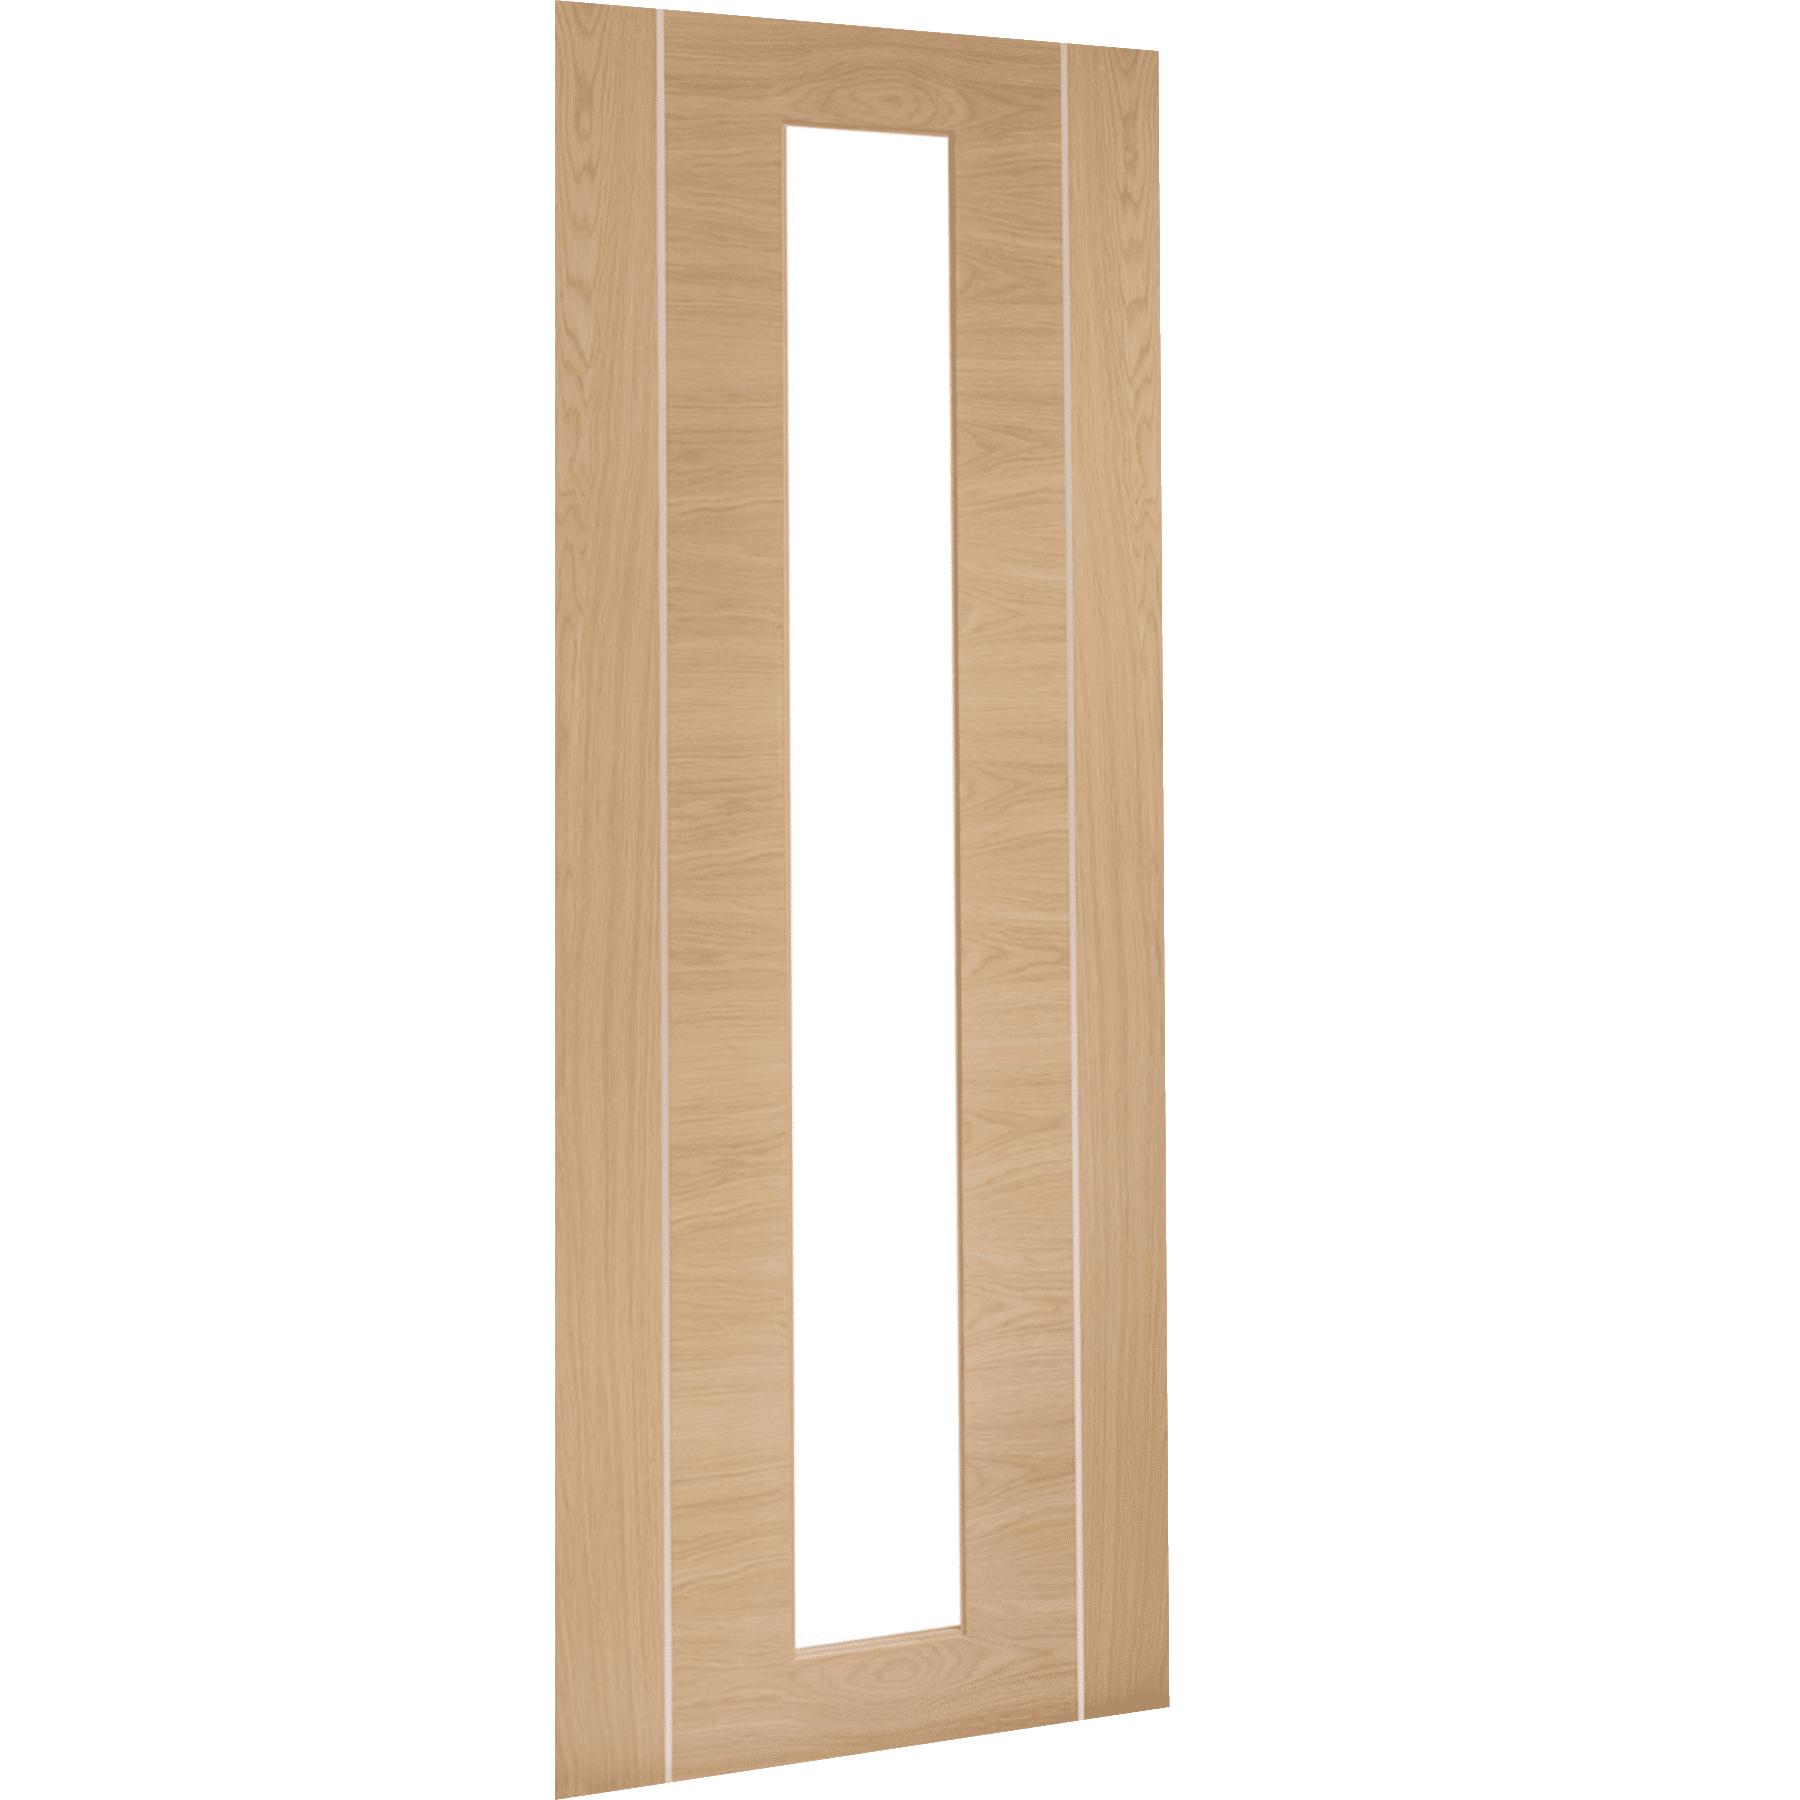 Forli Pre-Finished Internal Oak Door with Clear Glass